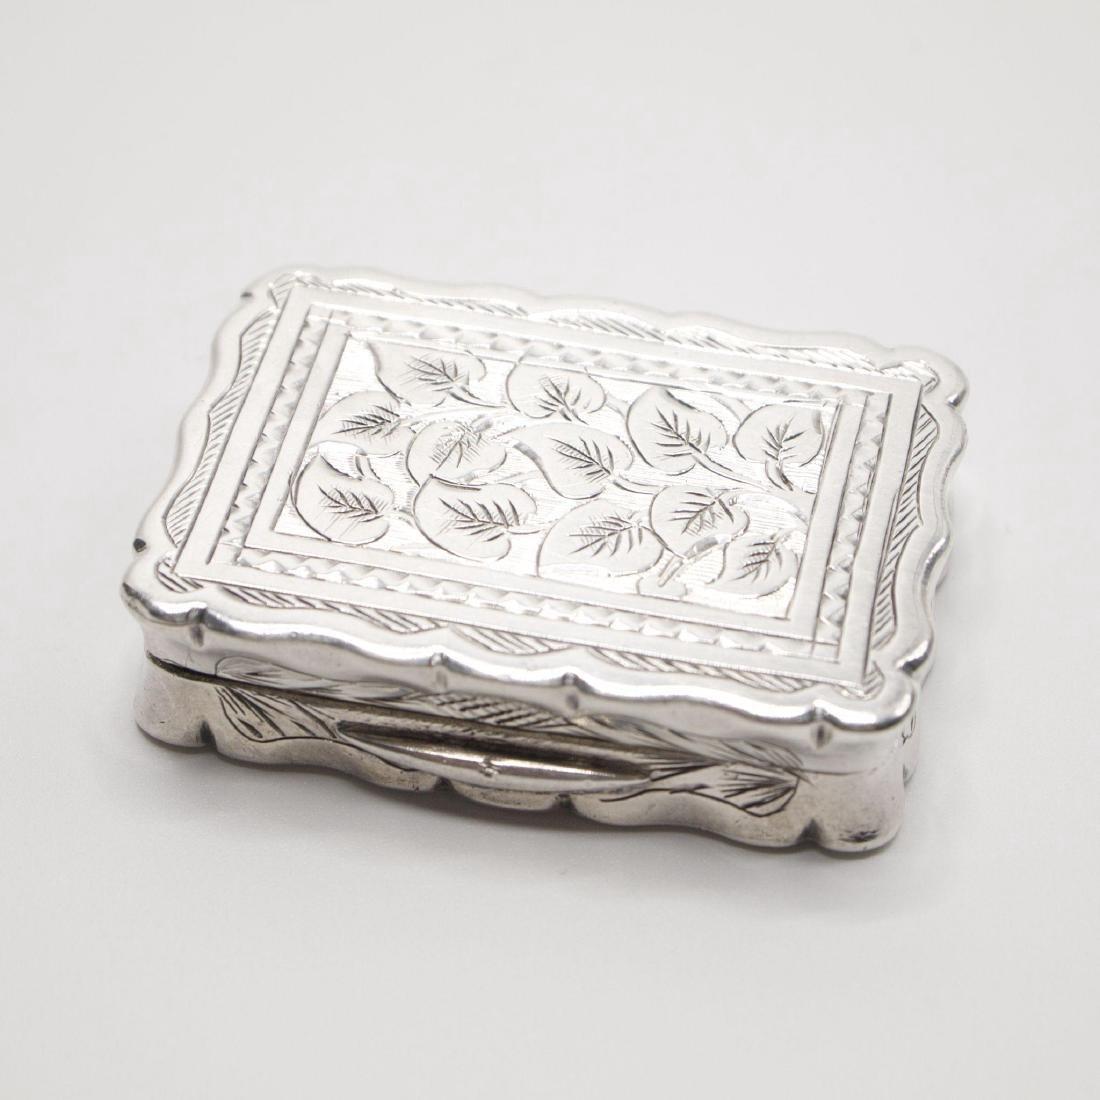 Antique Victorian Sterling Silver Vinaigrette, 1875 - 5